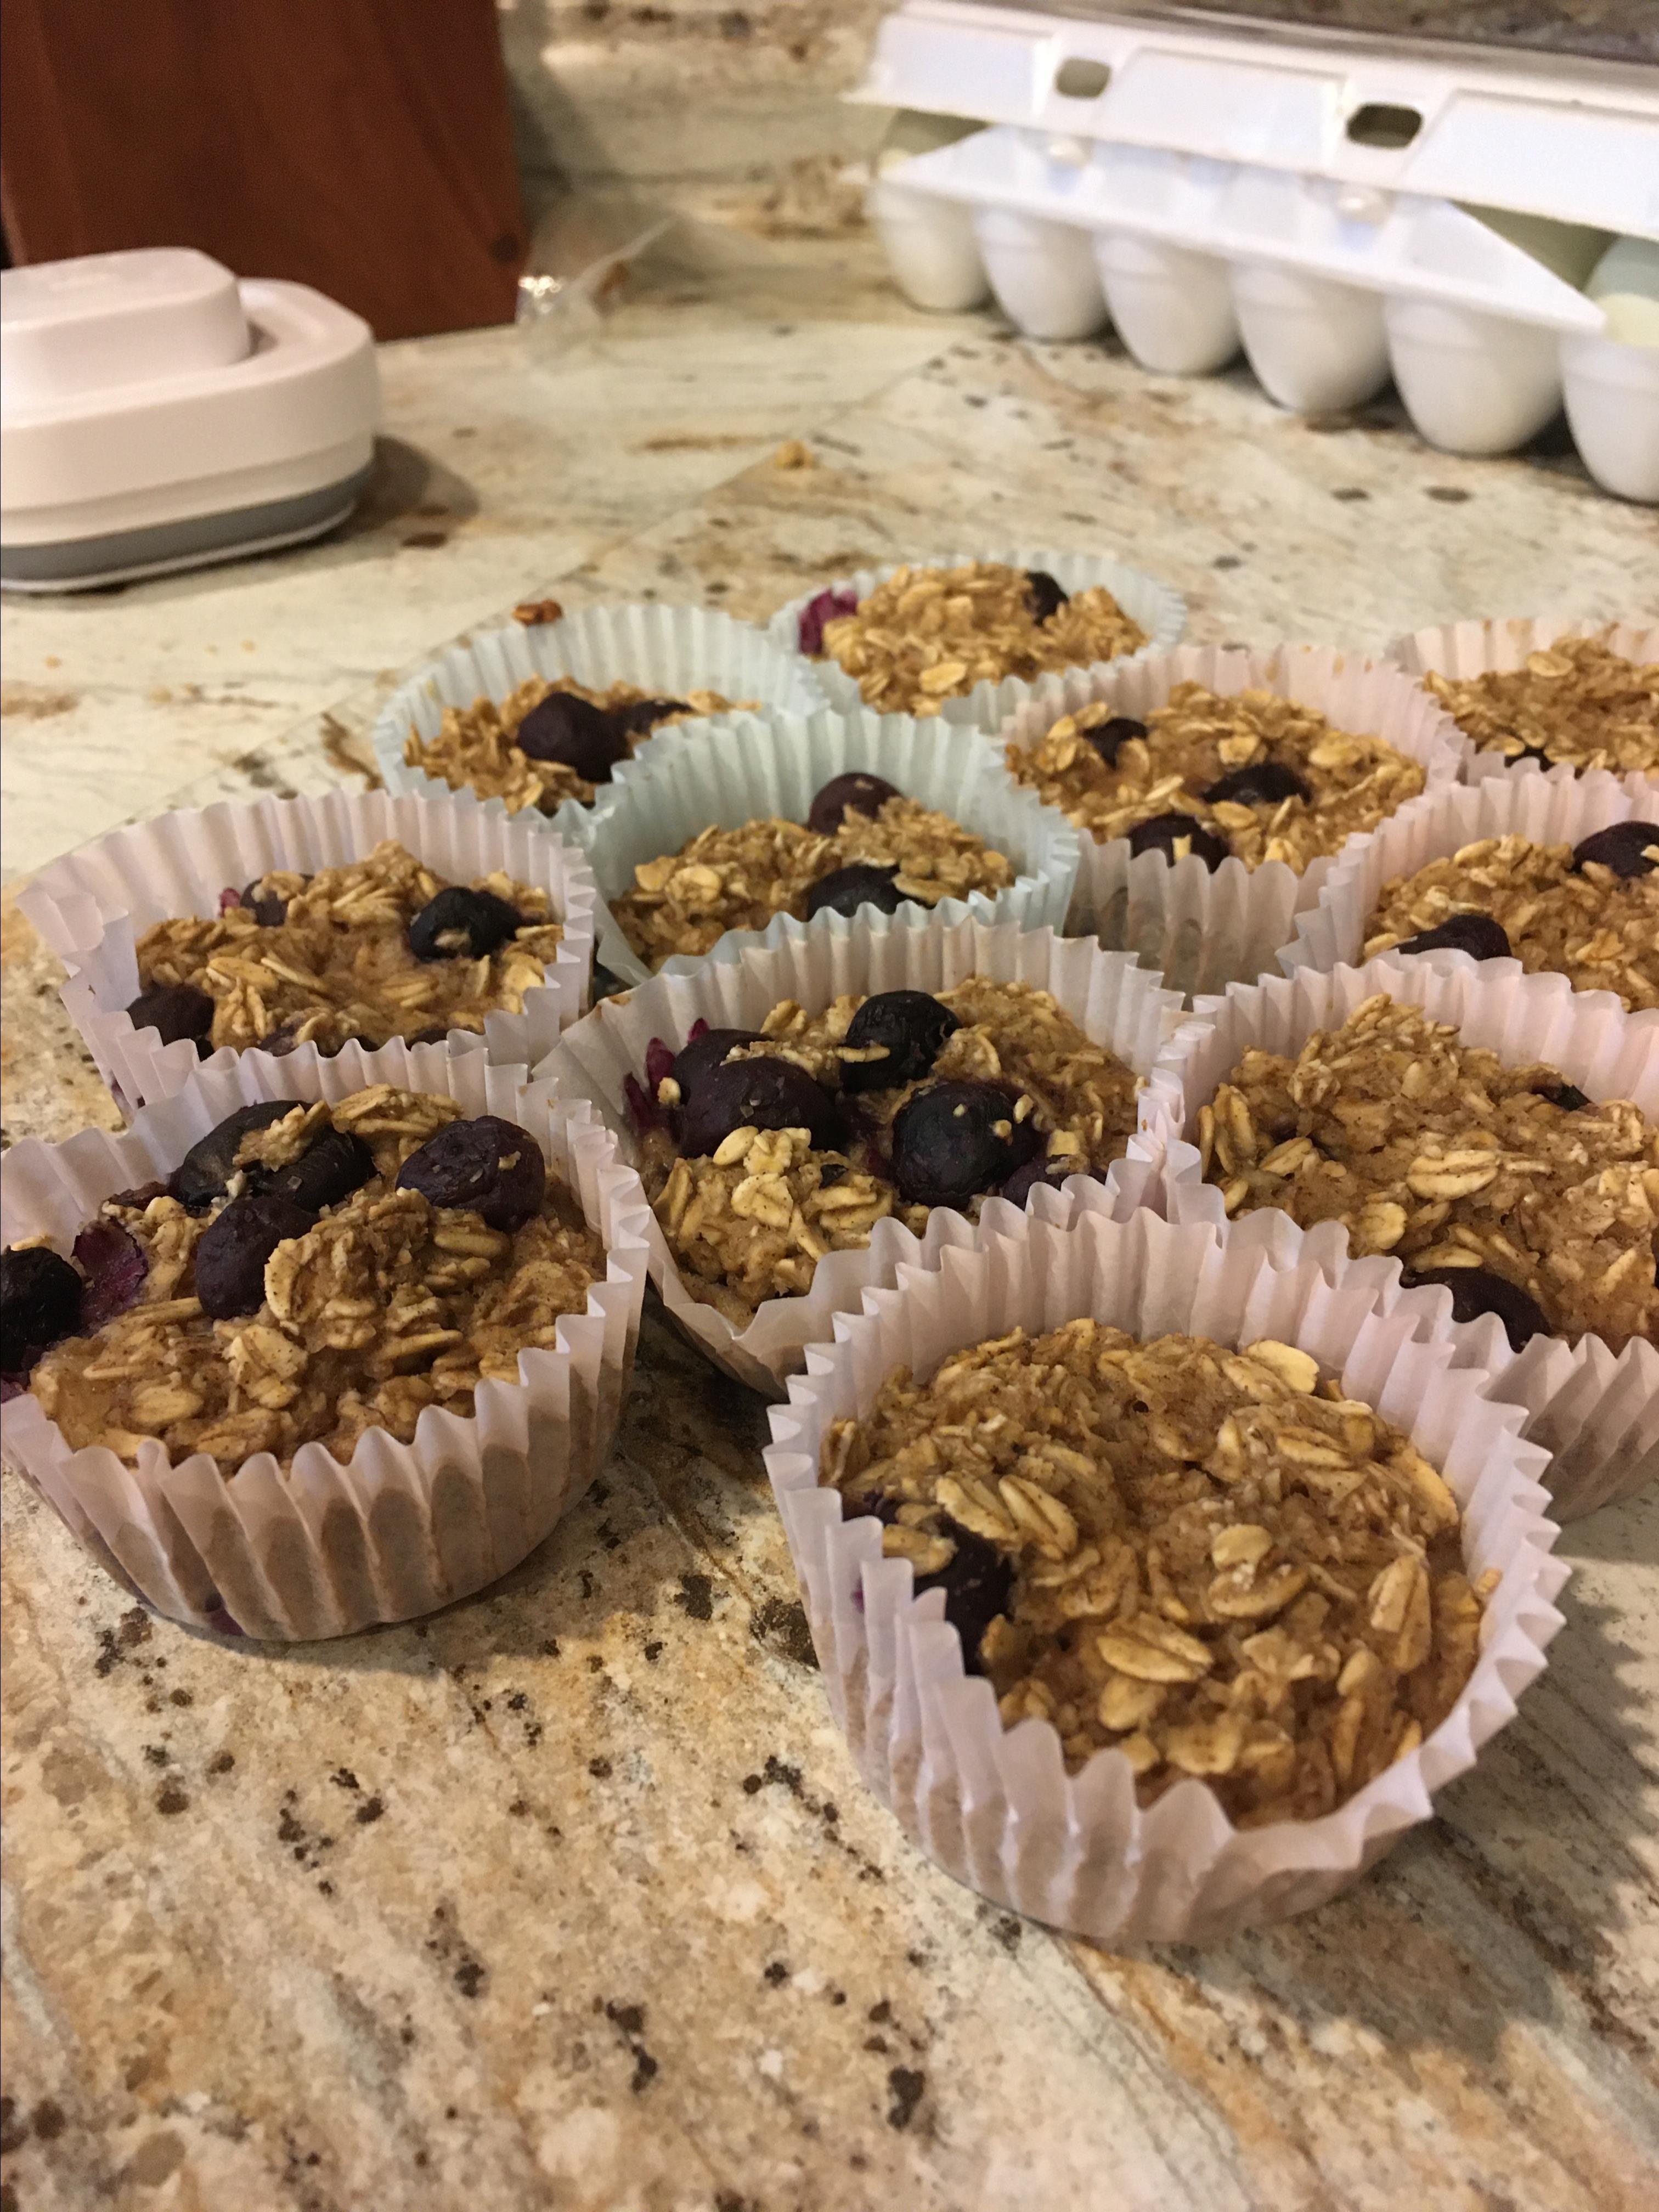 Vegan Blueberry and Banana Oatmeal Muffins